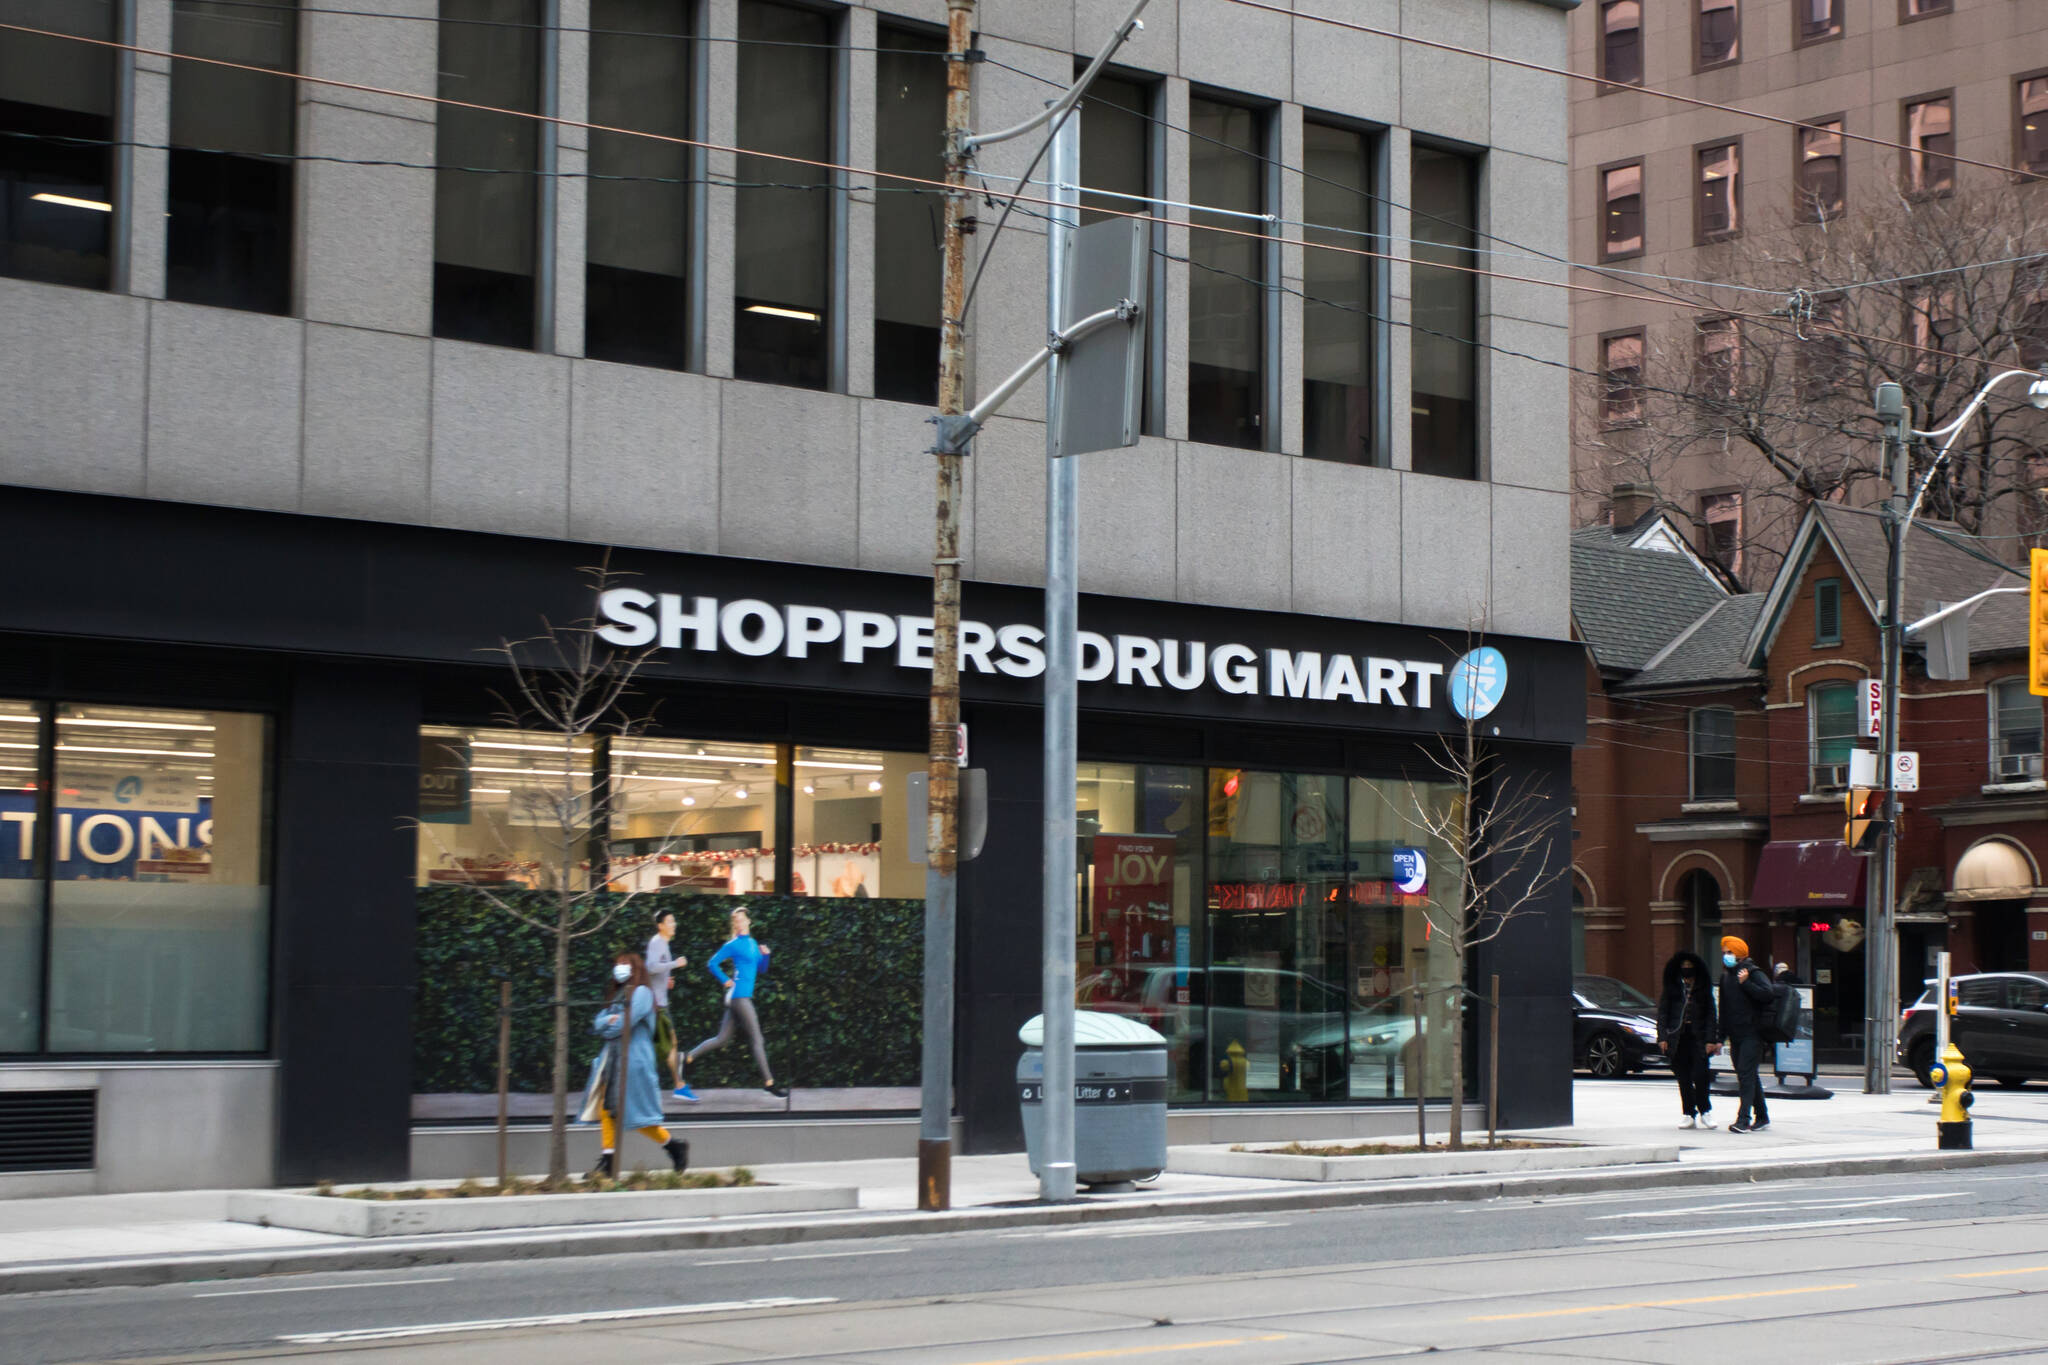 shoppers drug mart rapid test covid